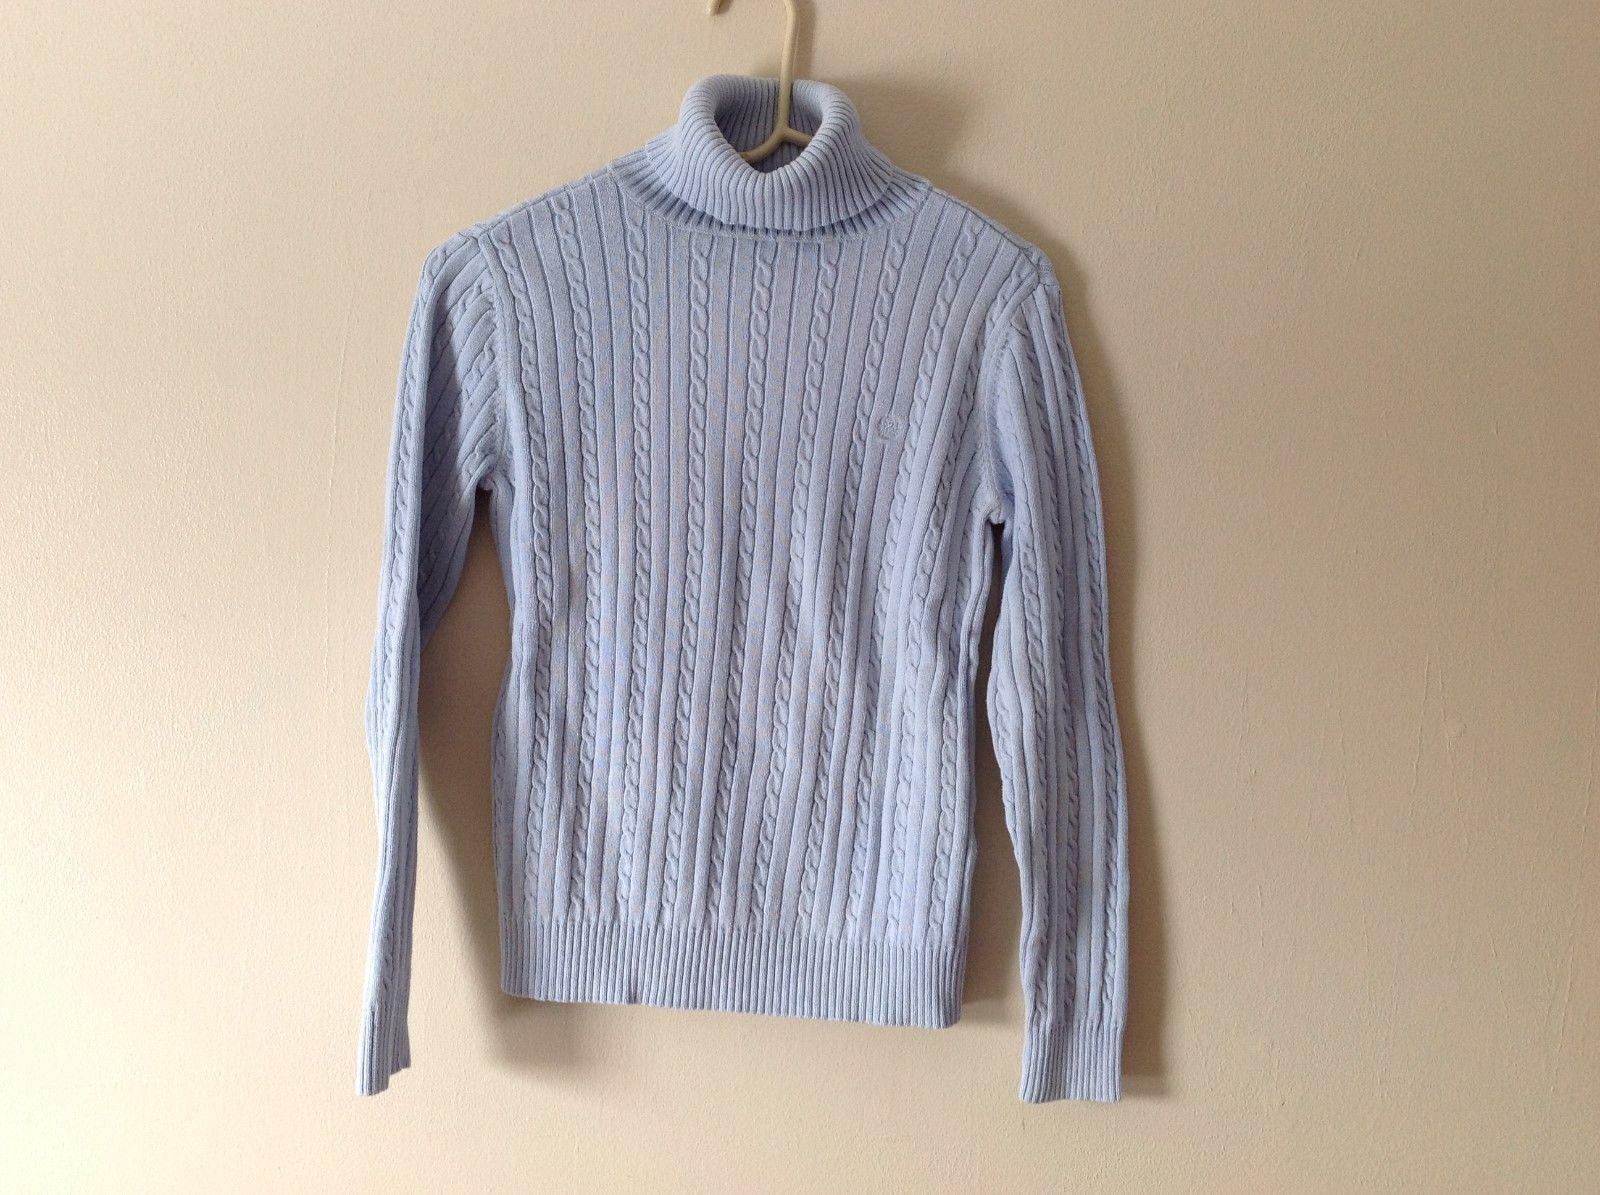 Womens IZOP turtleneck sweater in baby blue